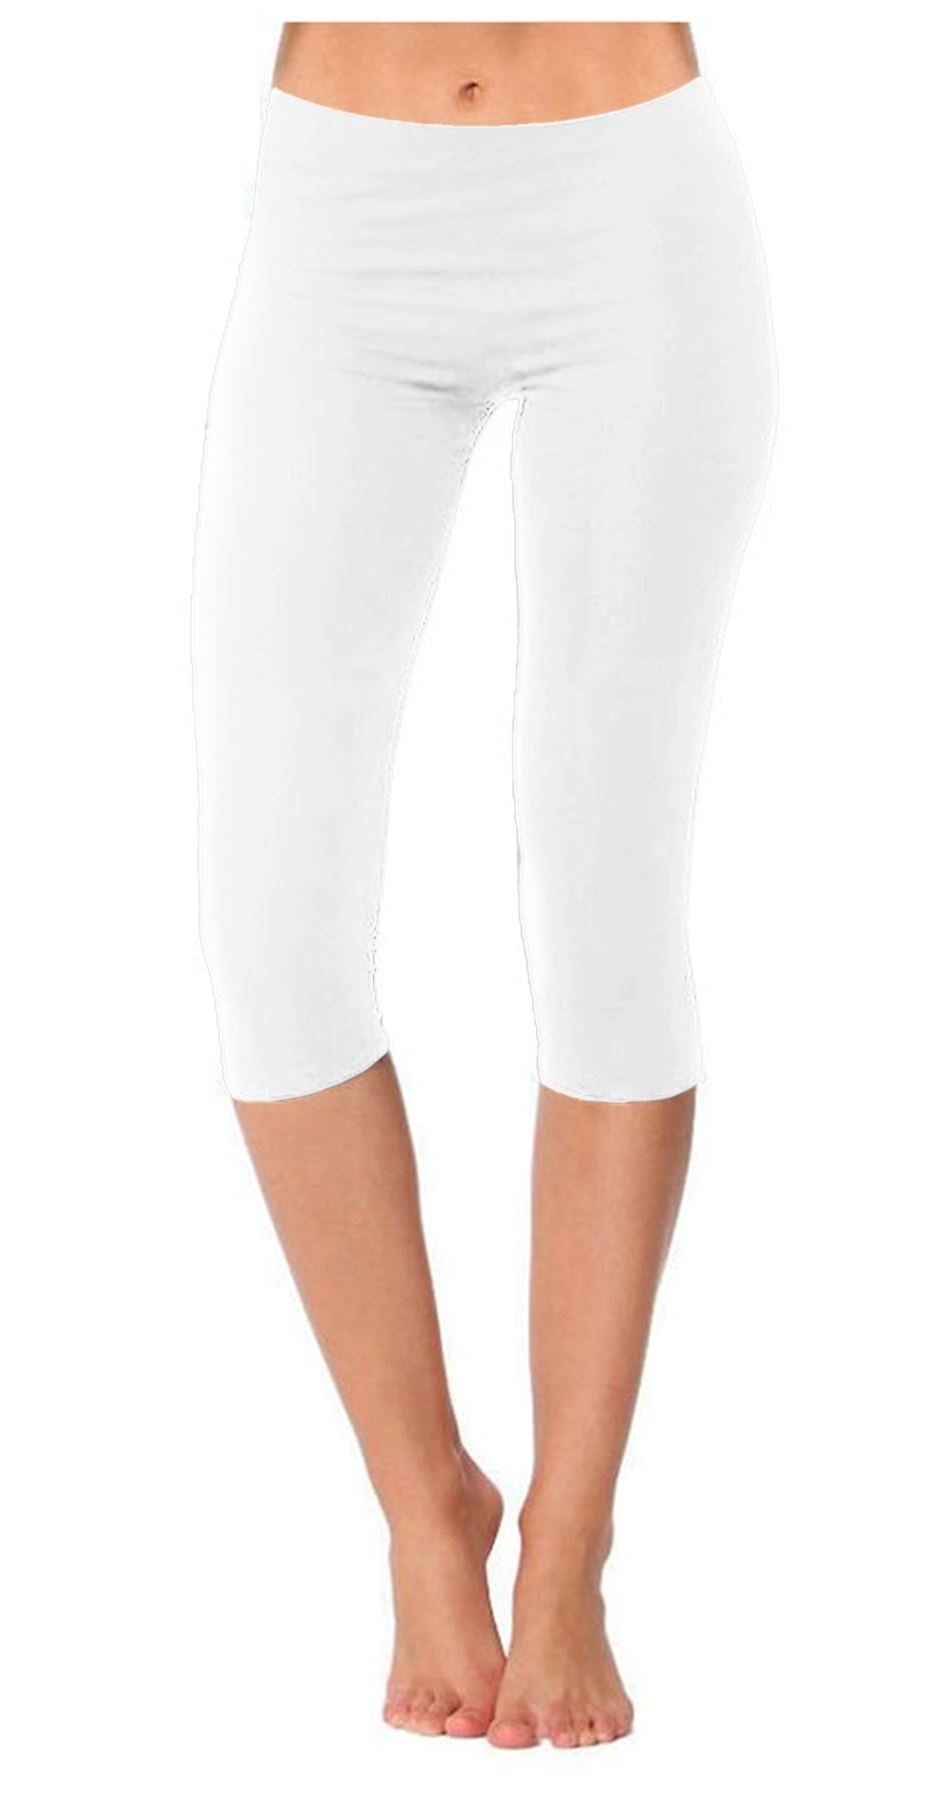 New-Girls-Kids-Gymnastics-Dance-Cotton-Plain-Cropped-3-4-Leggings-Capri-Pants miniatuur 13